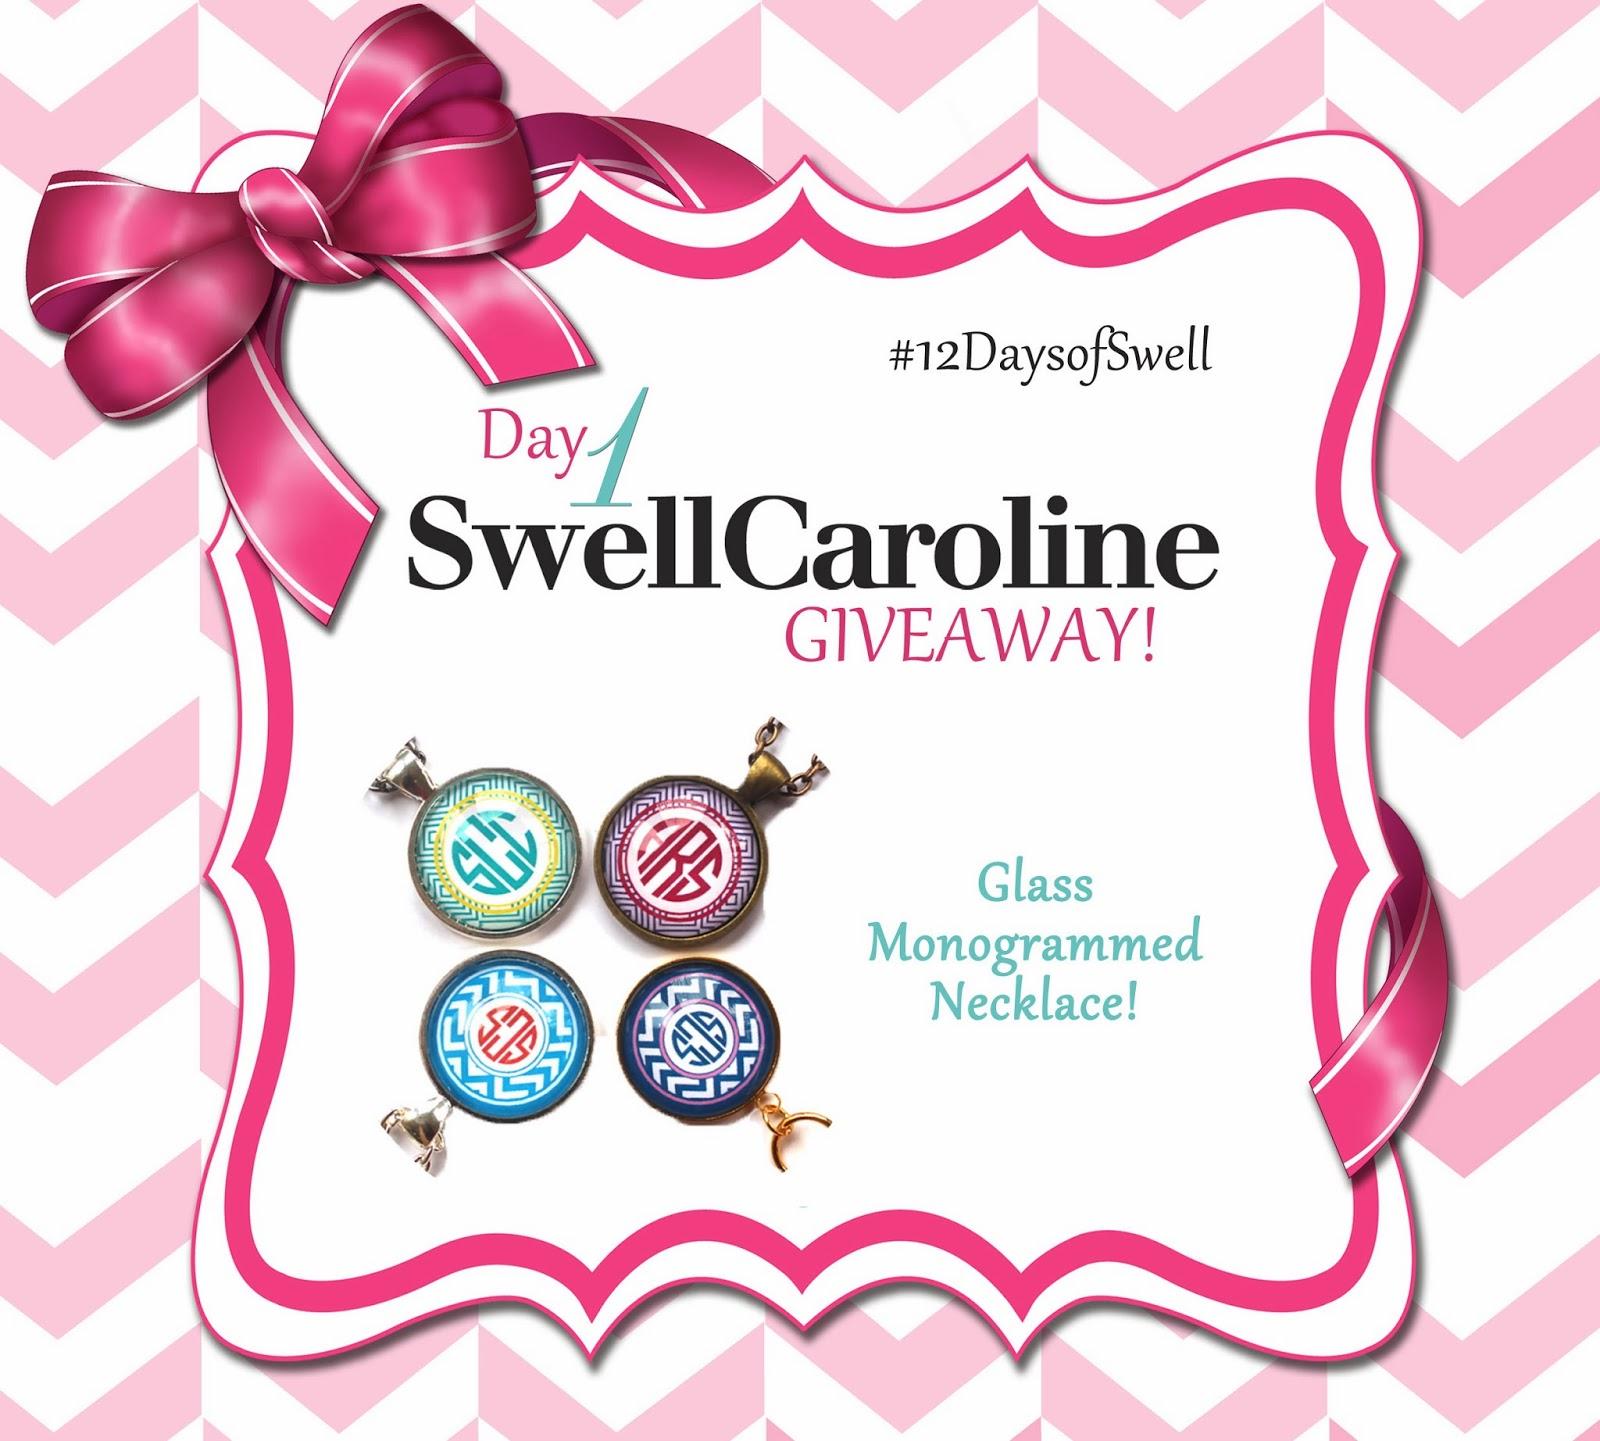 http://www.swellcaroline.com/behind-the-glass-monogram-pendant-necklace.html